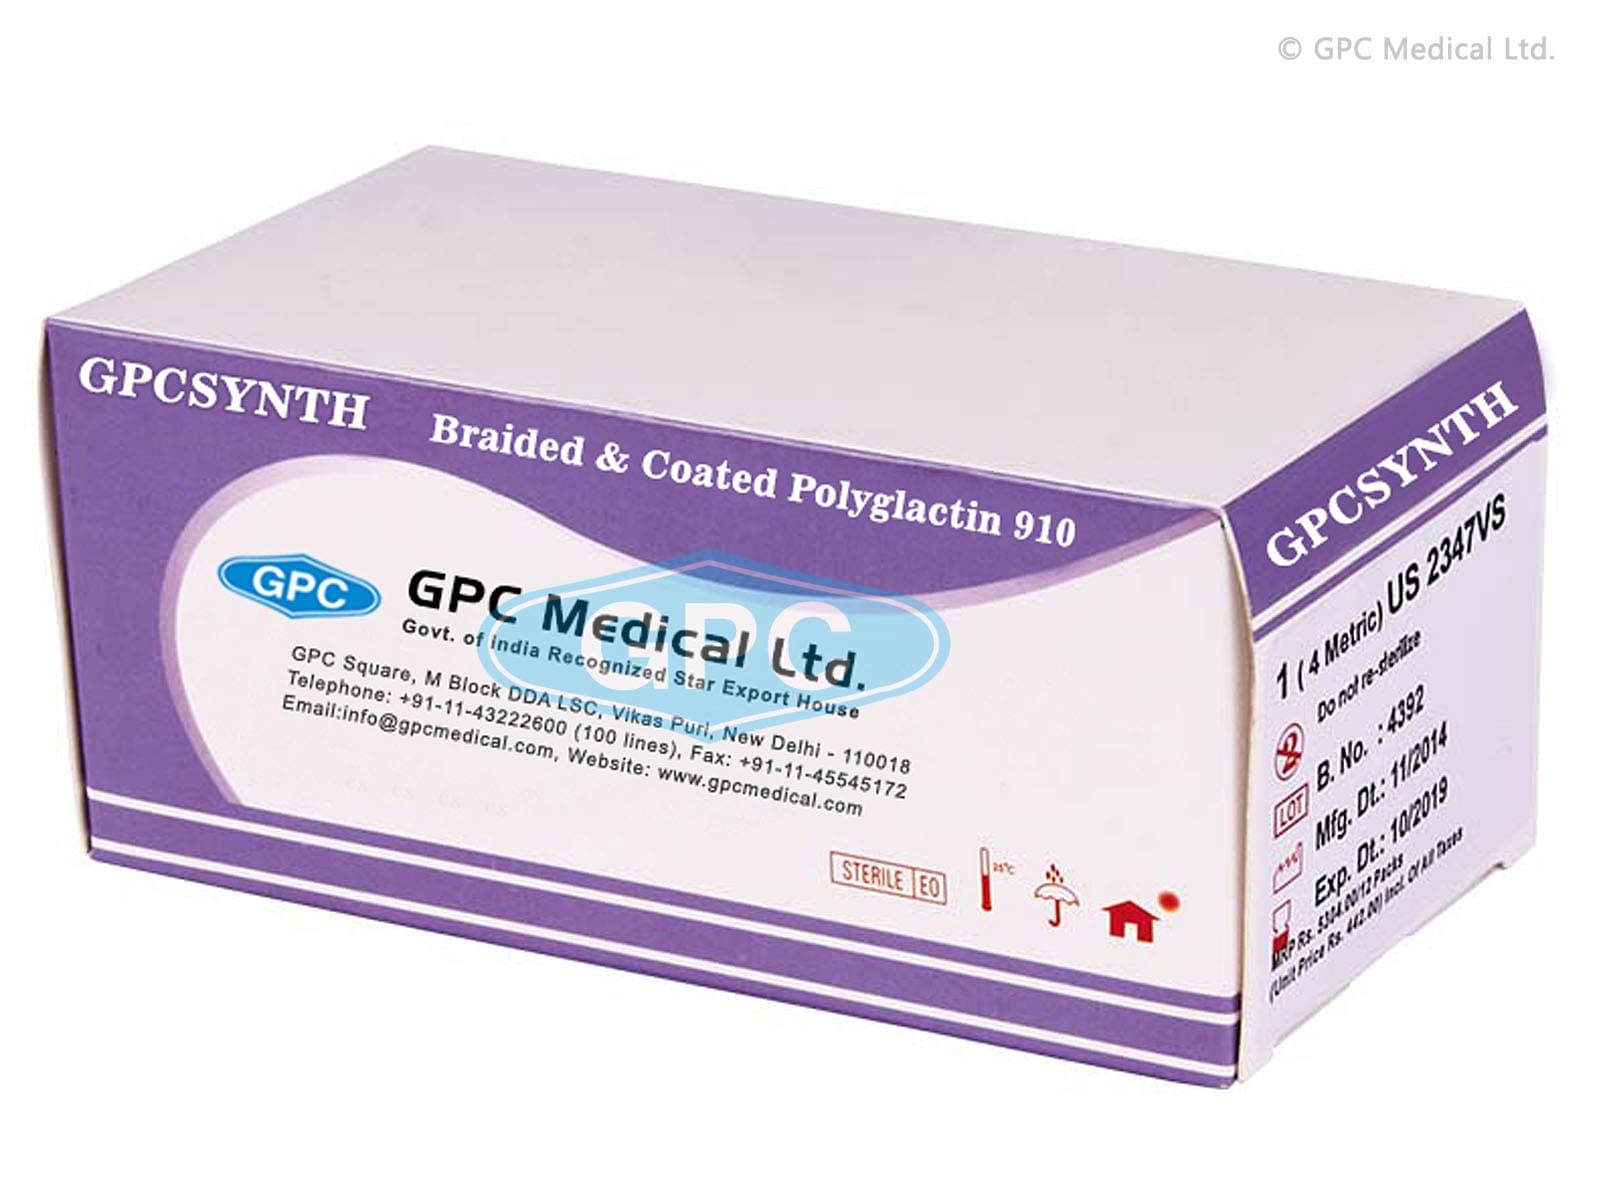 GPCSYNTH - Braided & Coated Polyglactin 910